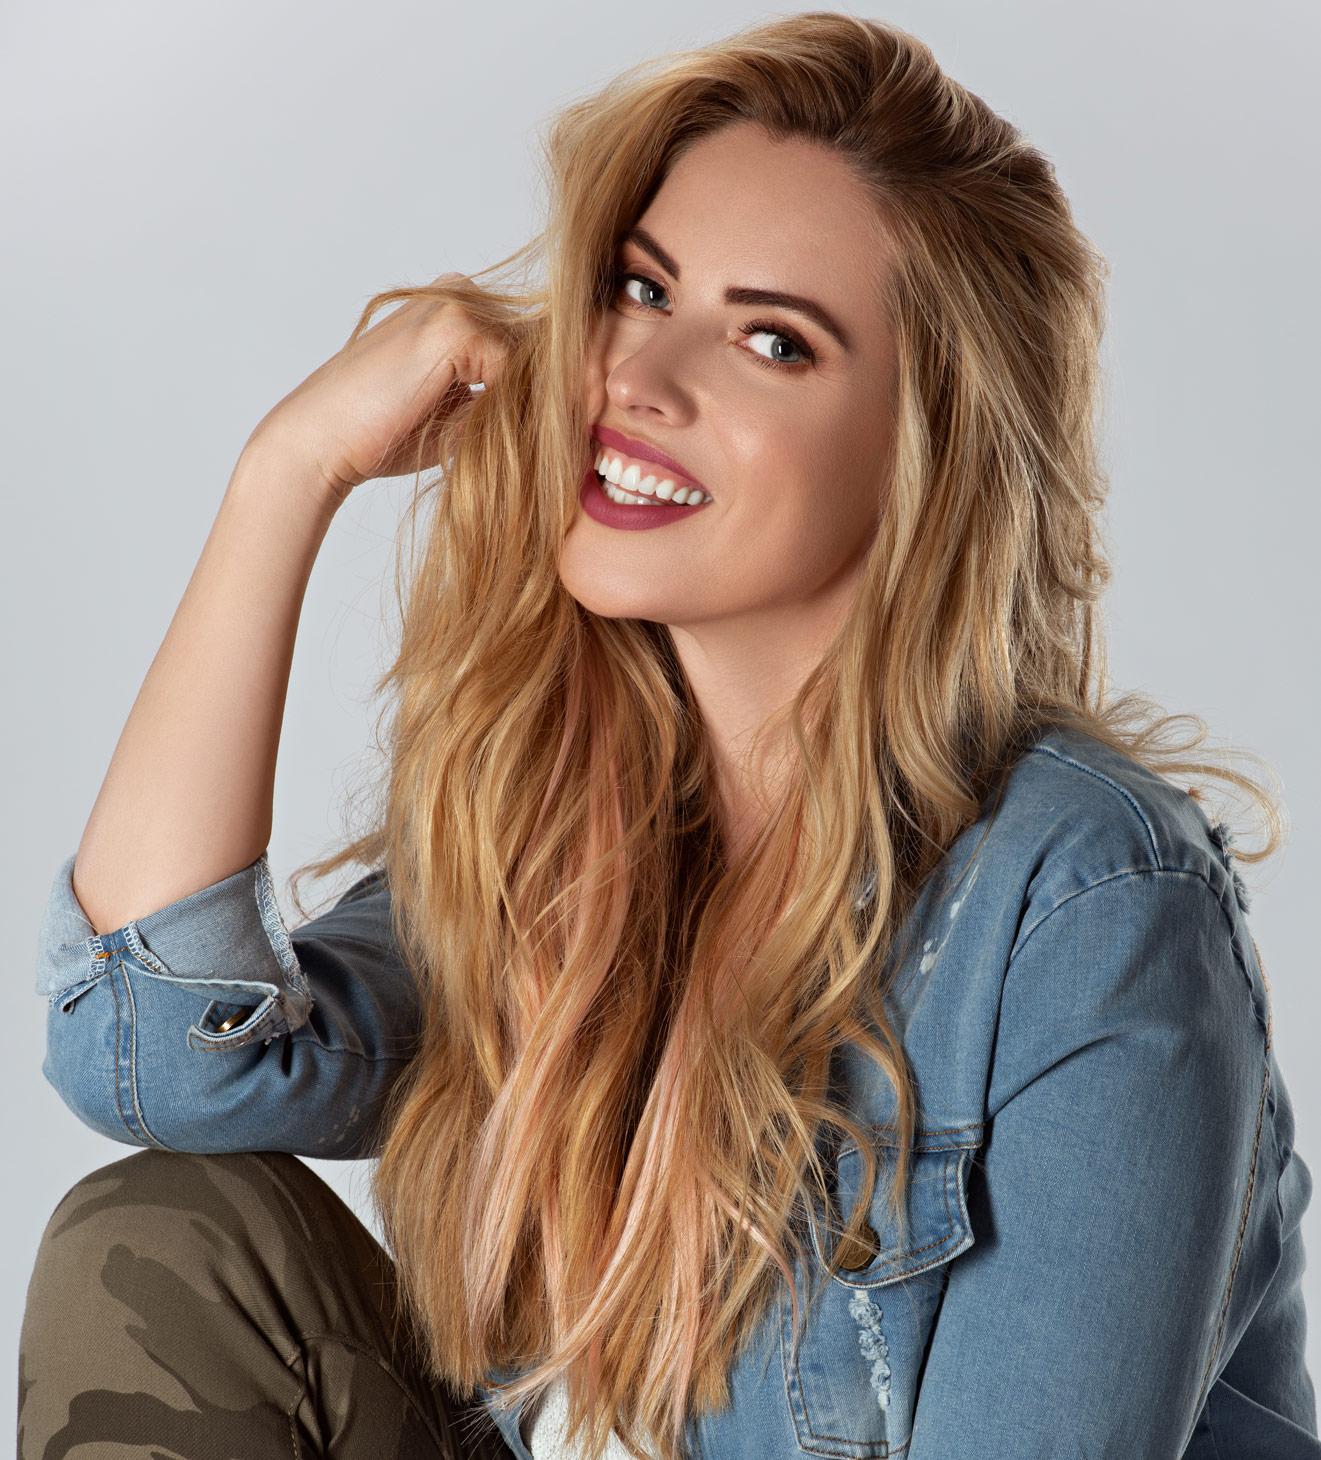 headshot of a model for hair salon